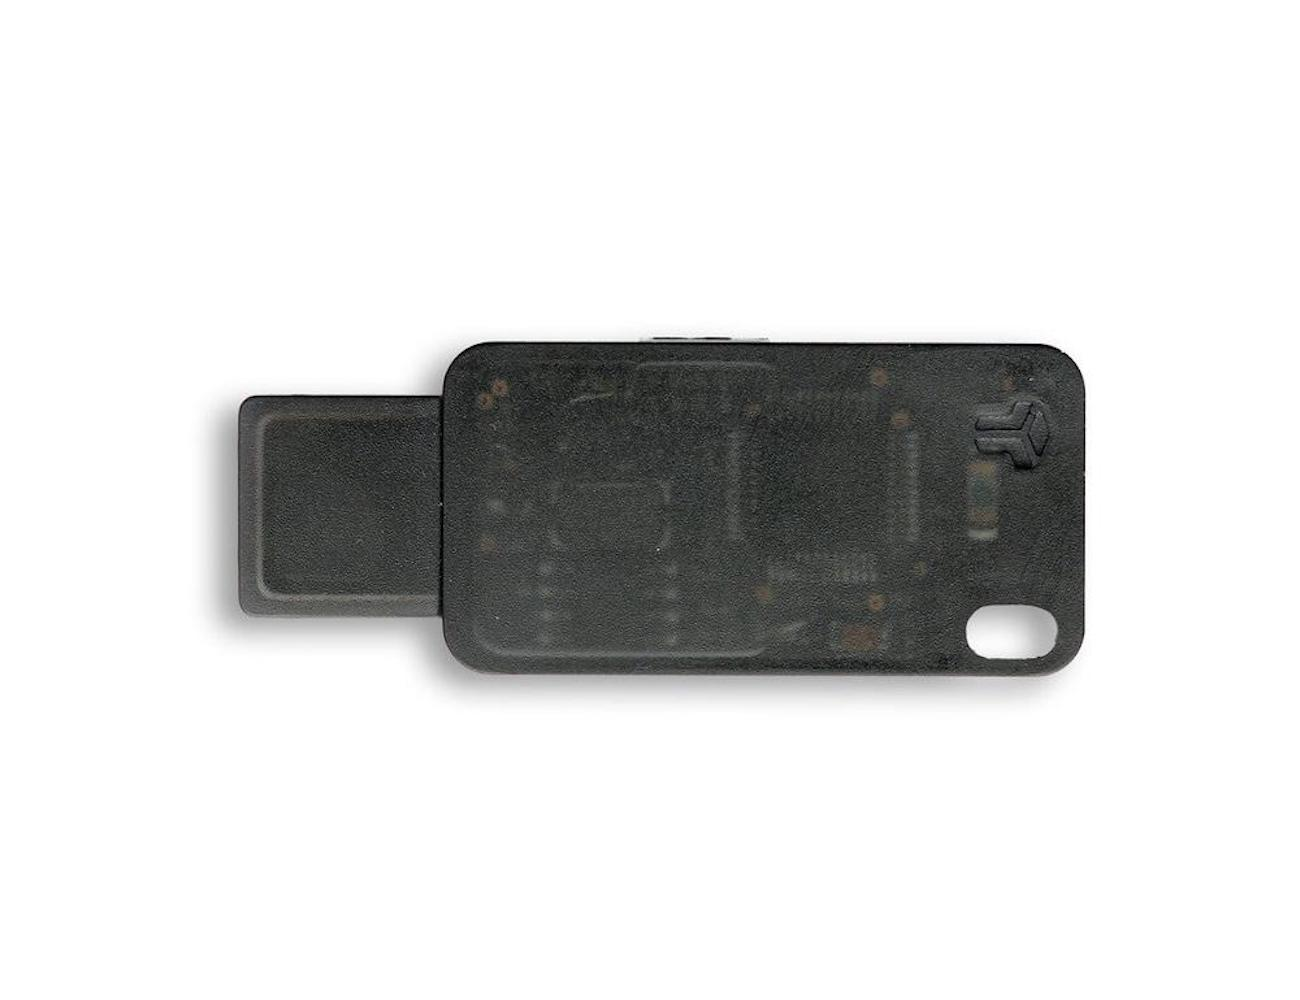 Digital Bitbox Minimalist Cryptocurrency Hardware Wallet